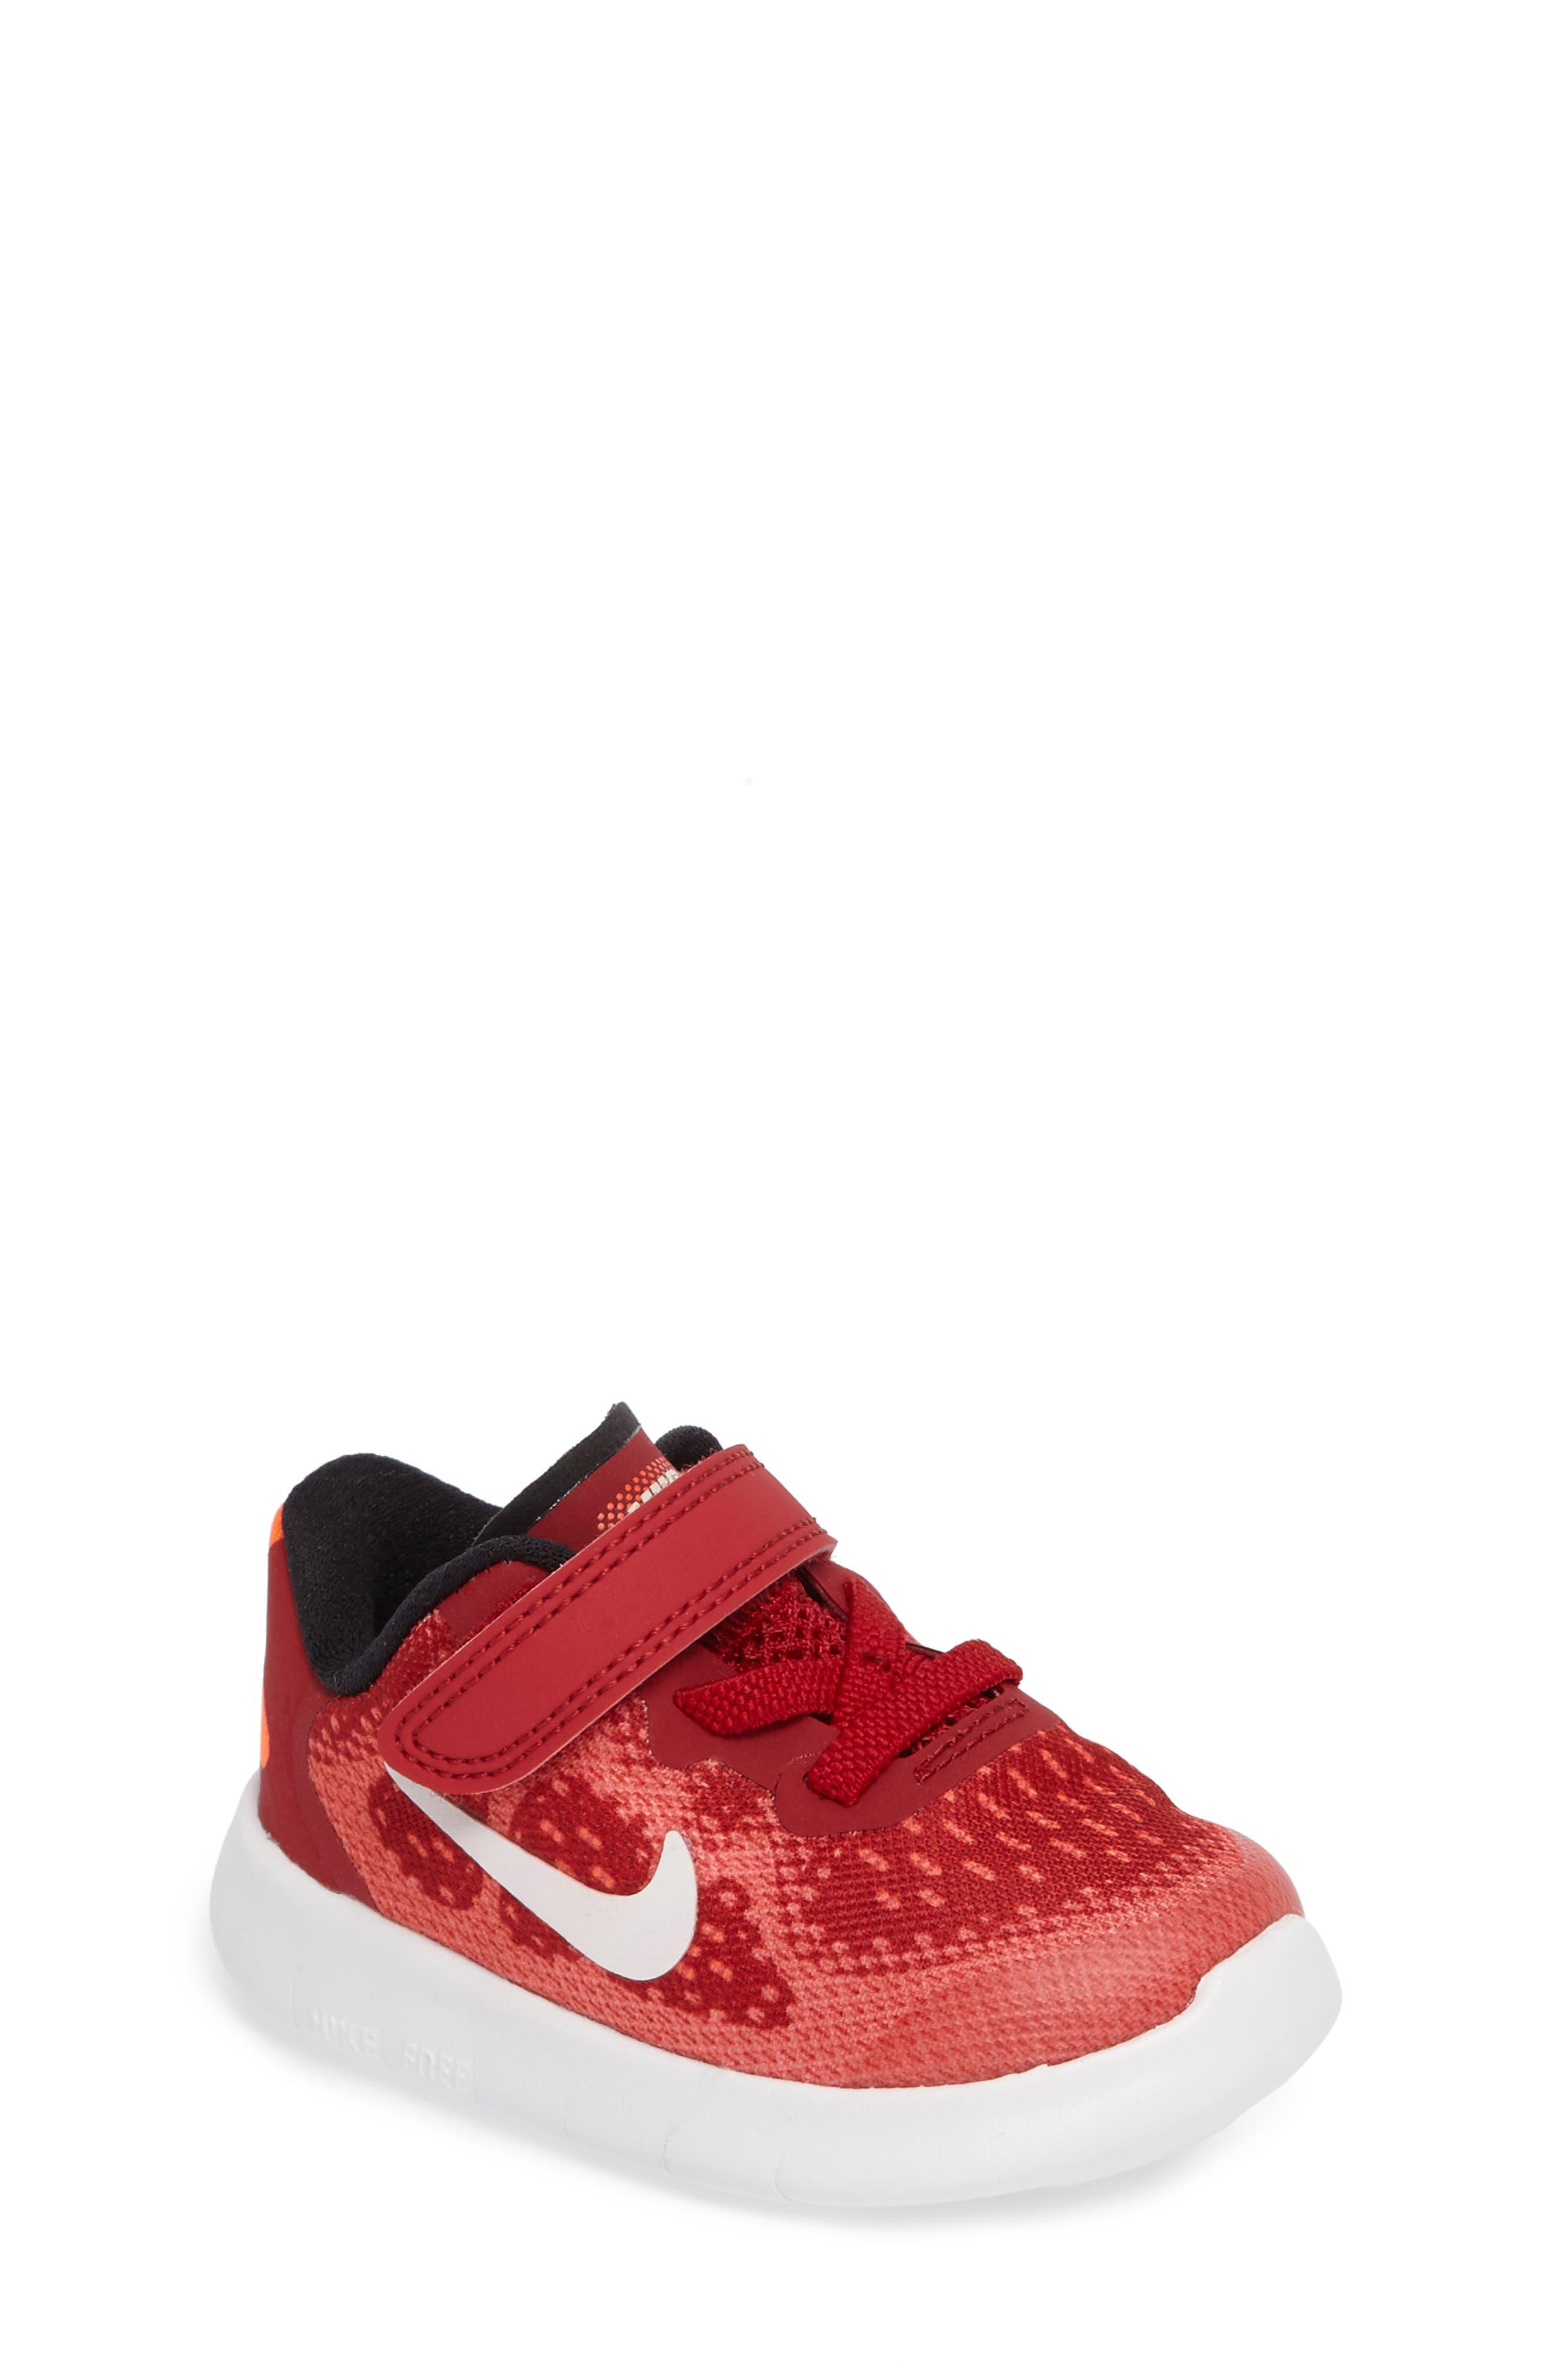 Main Image - Nike Free RN 2017 Sneaker (Baby, Walker, Toddler & Little